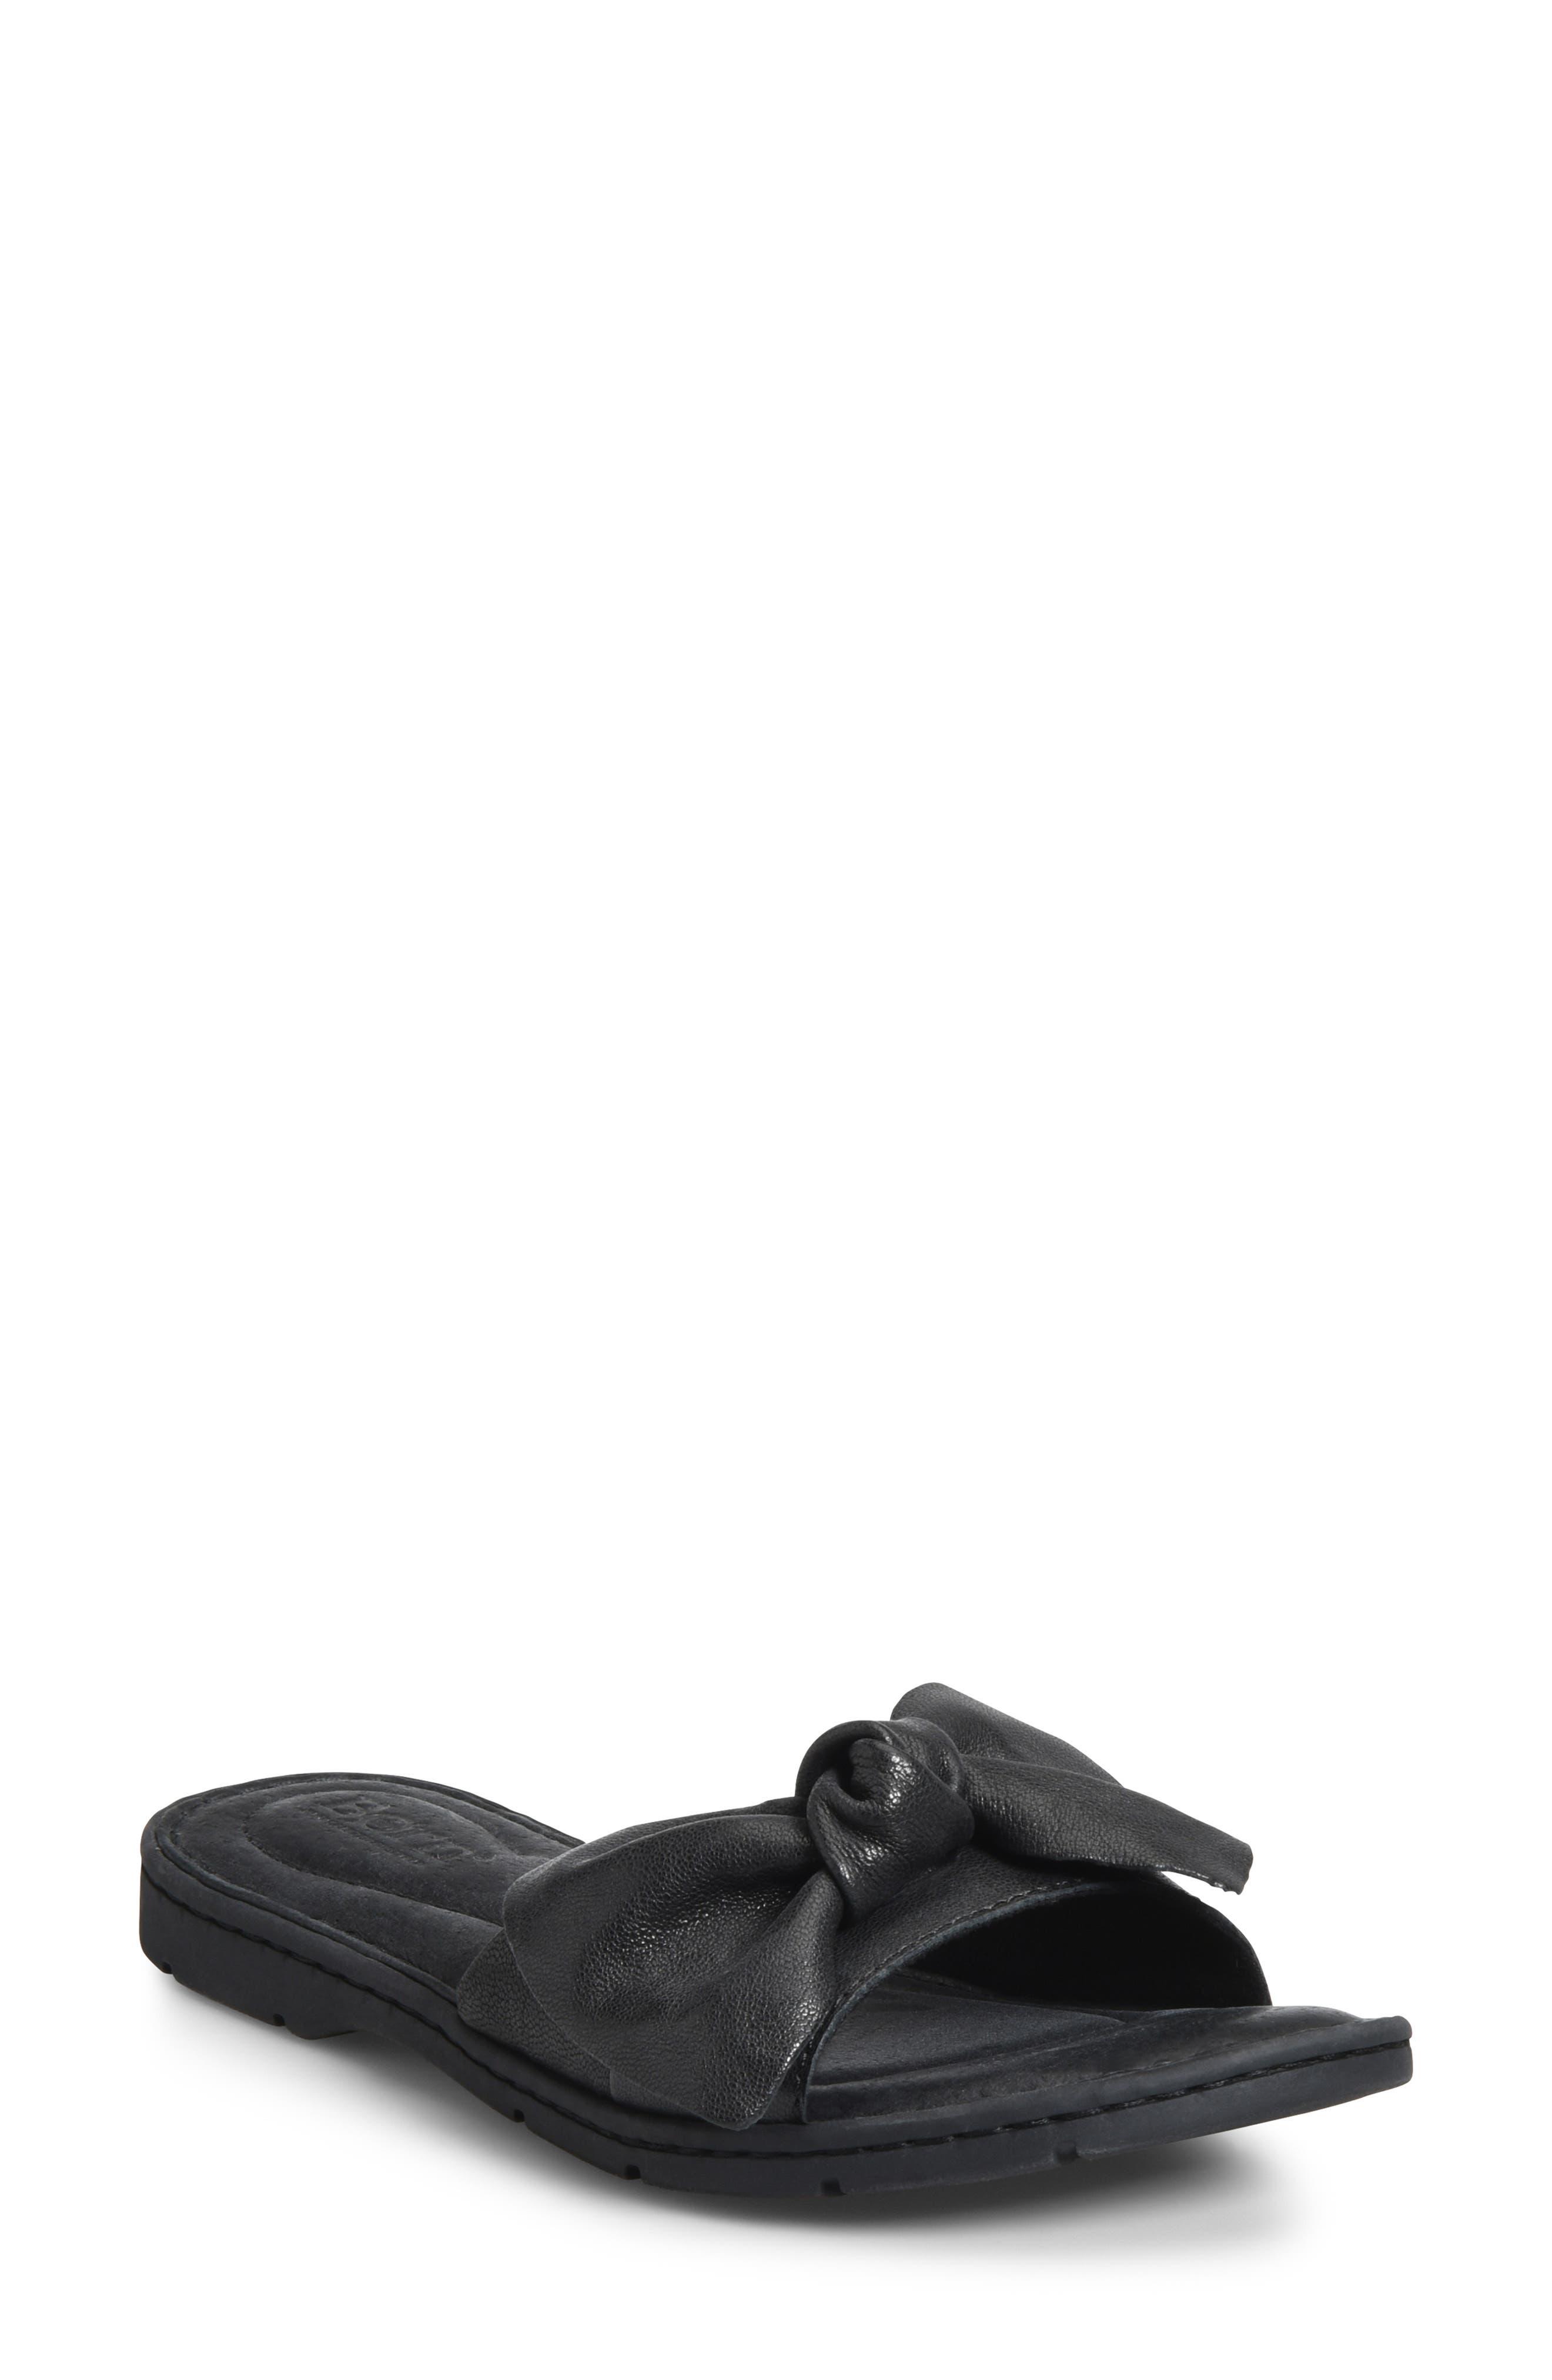 B?rn Teton Knotted Slide Sandal, Black